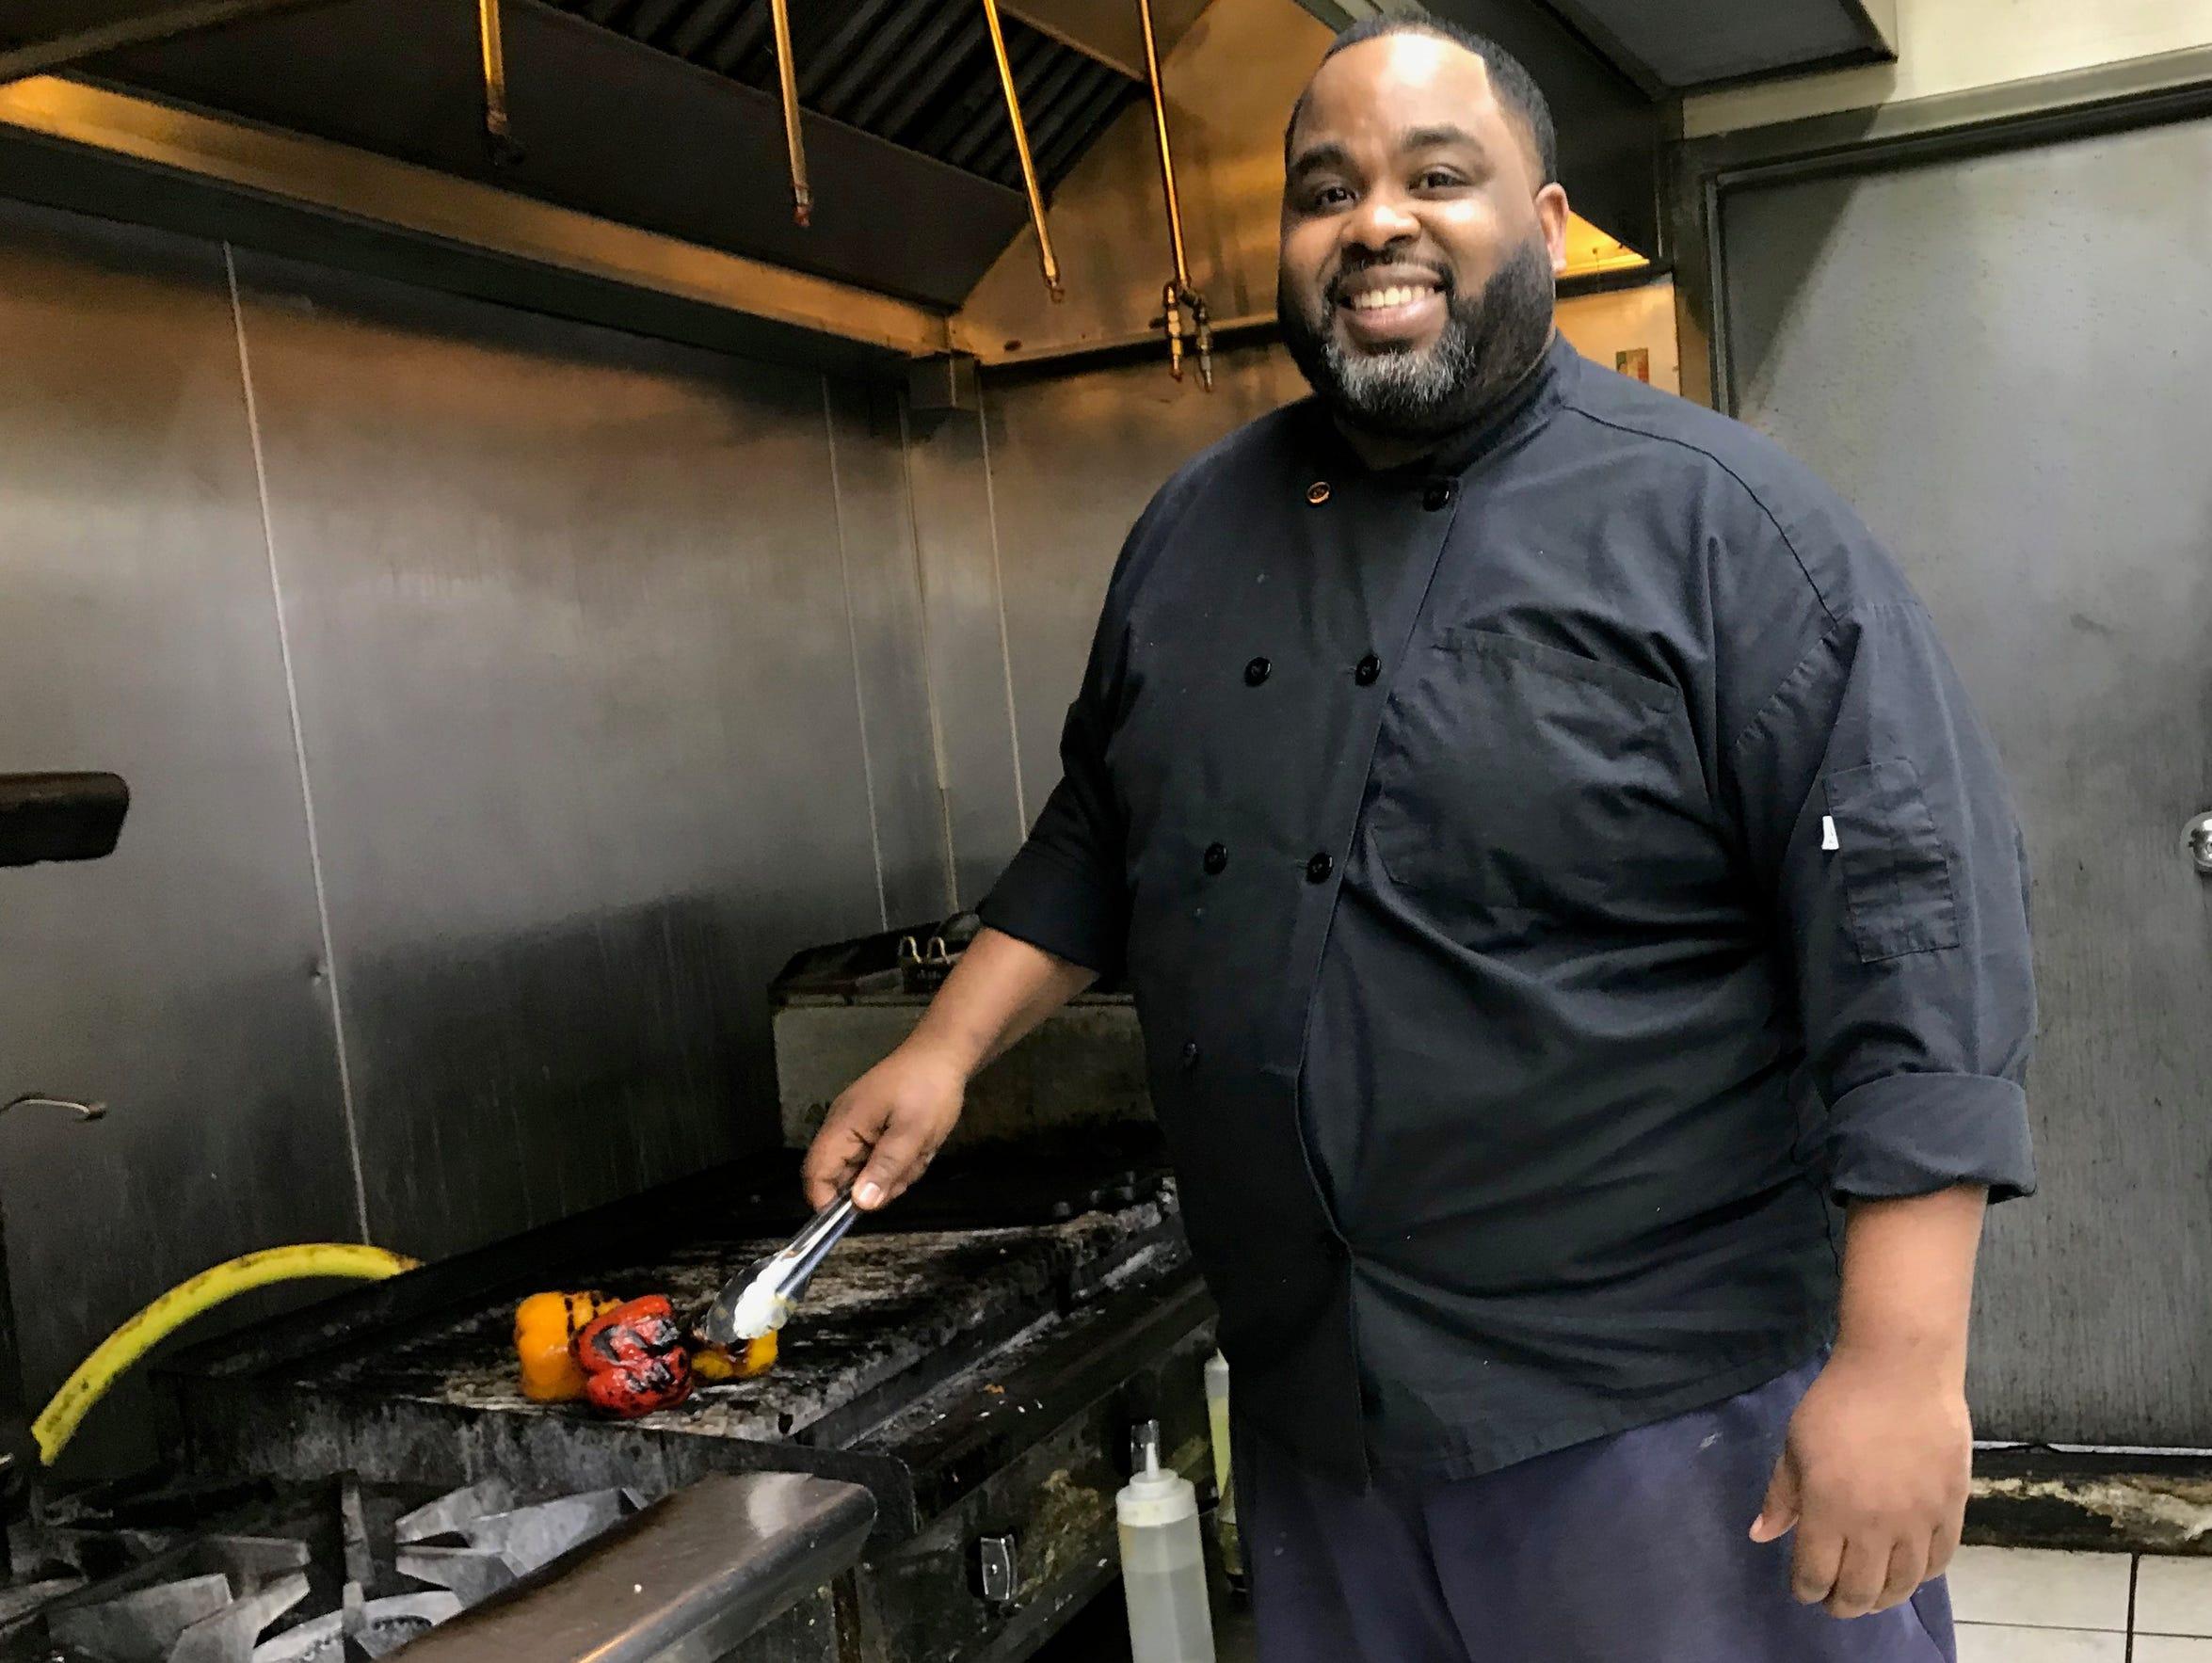 Muhtasib Dirul-Islam at his restaurant, SumThingGood,